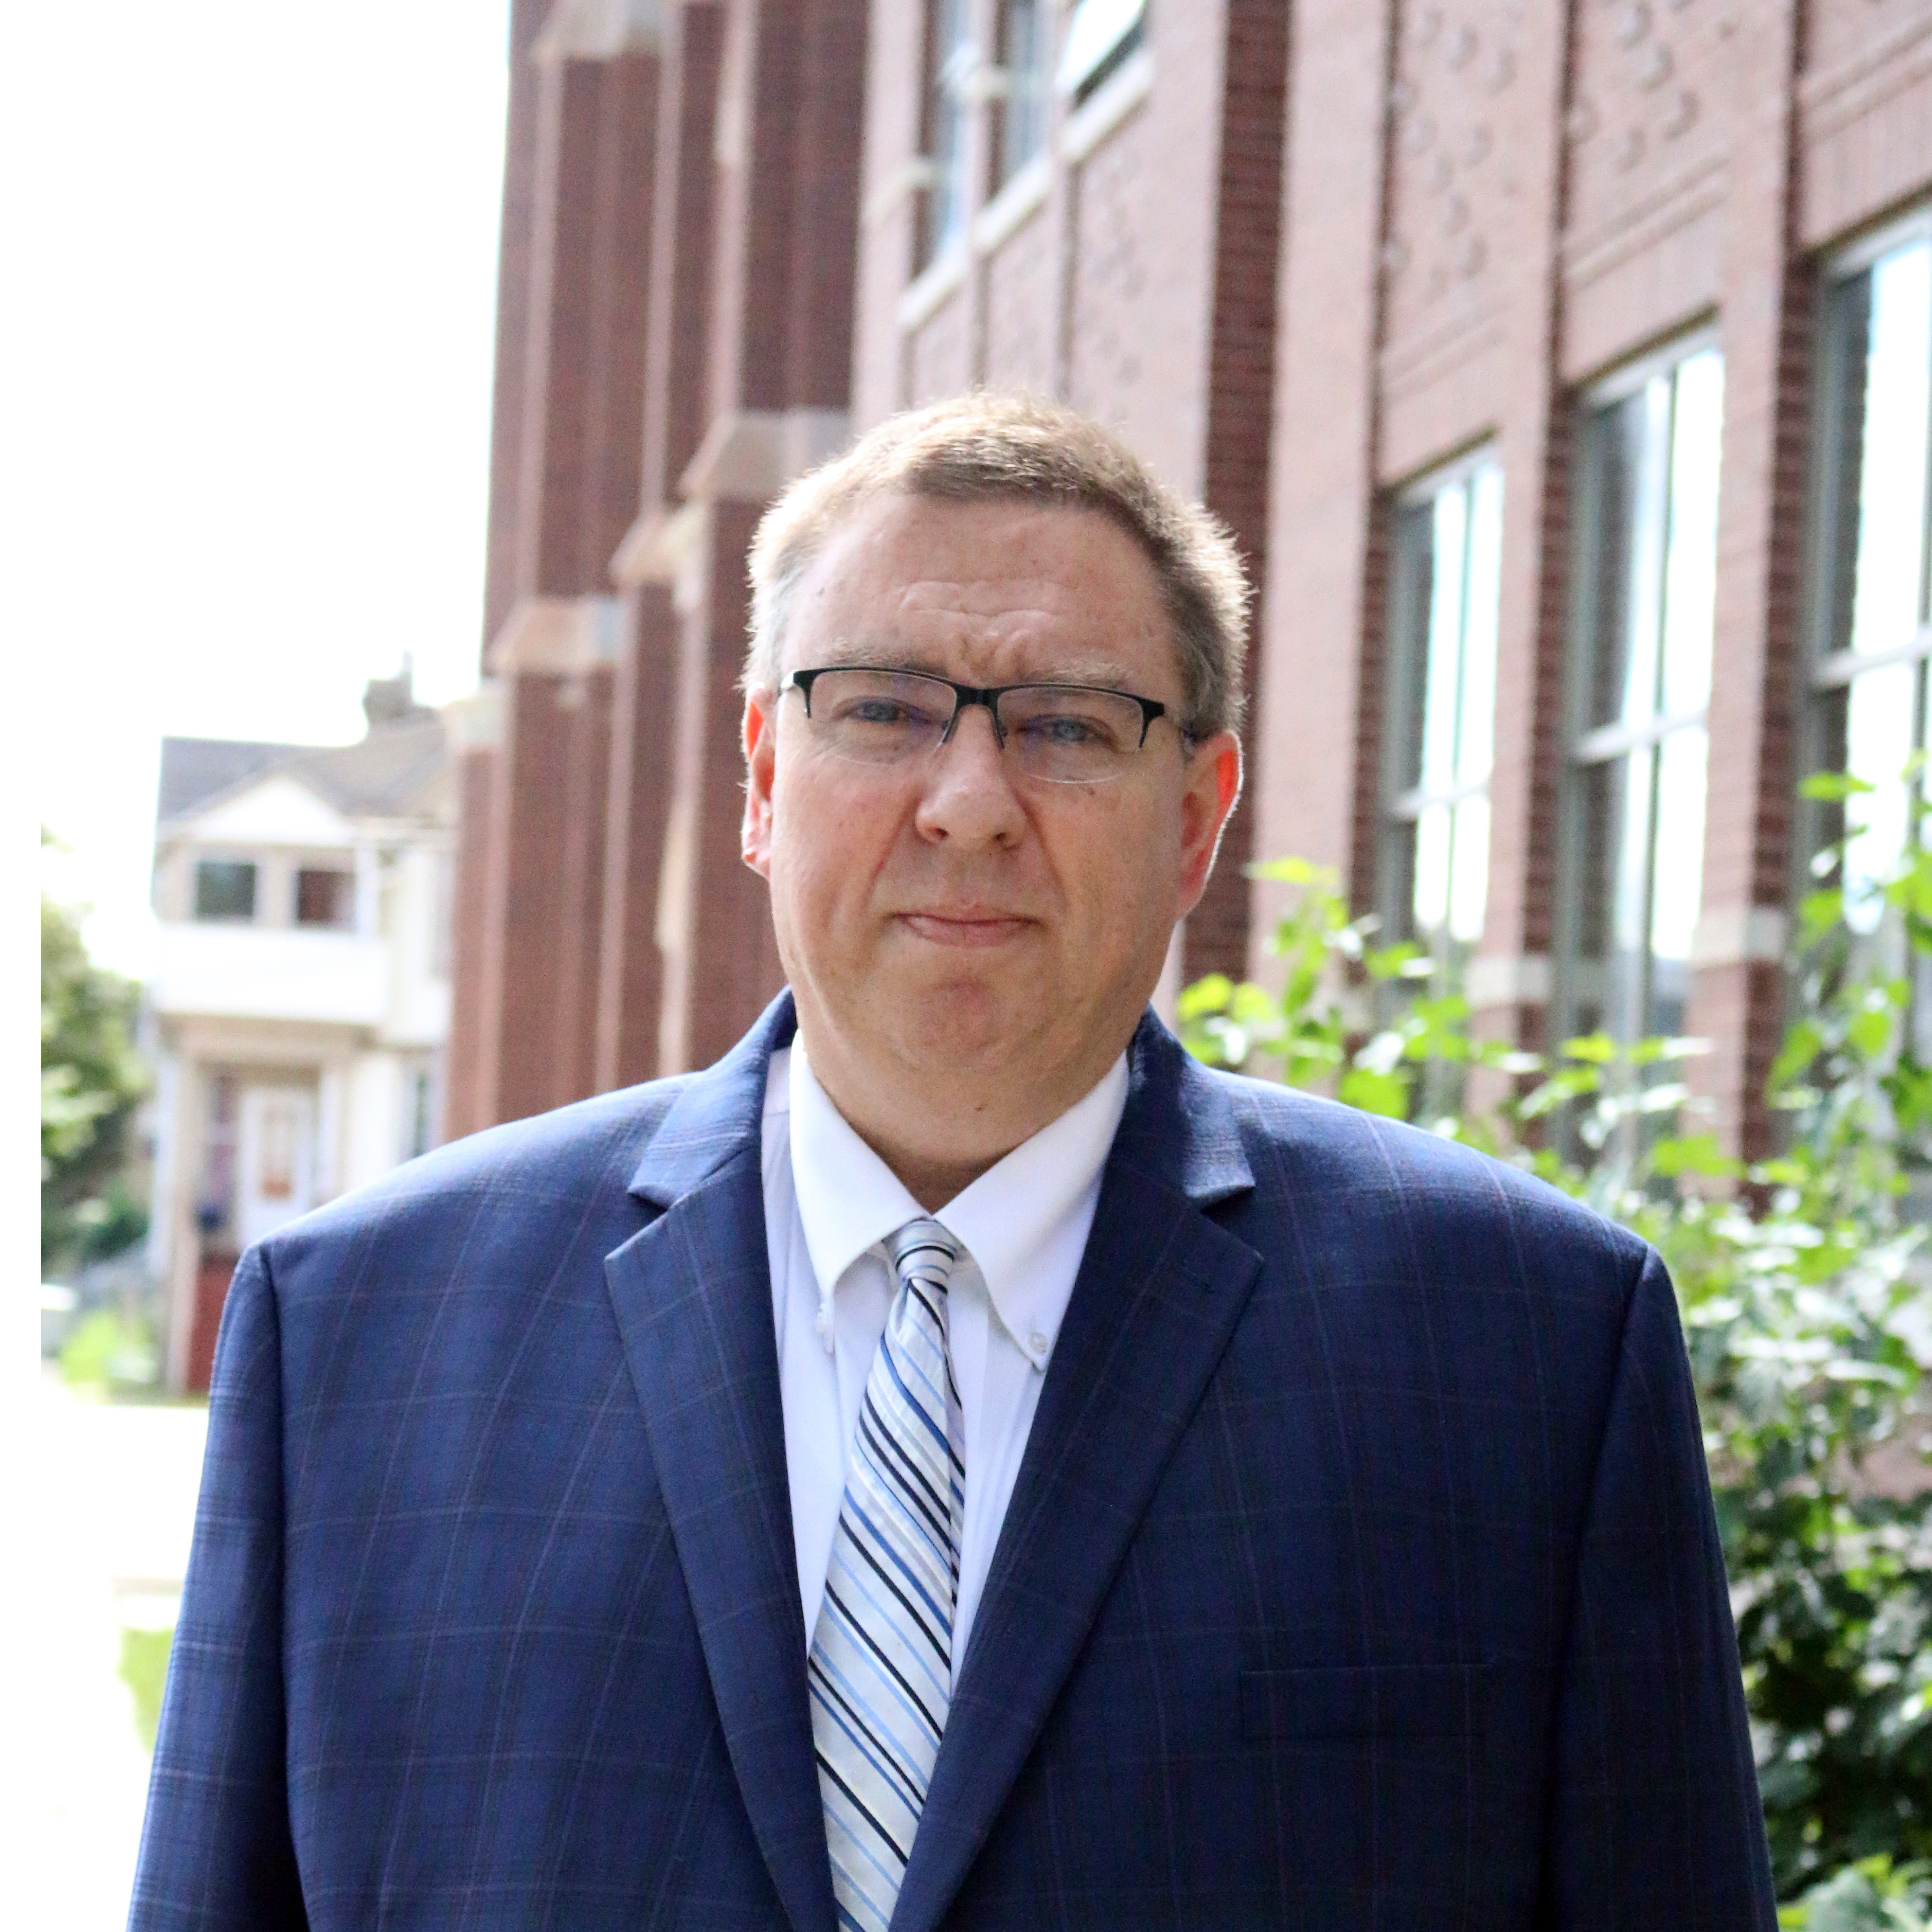 Jim Datka